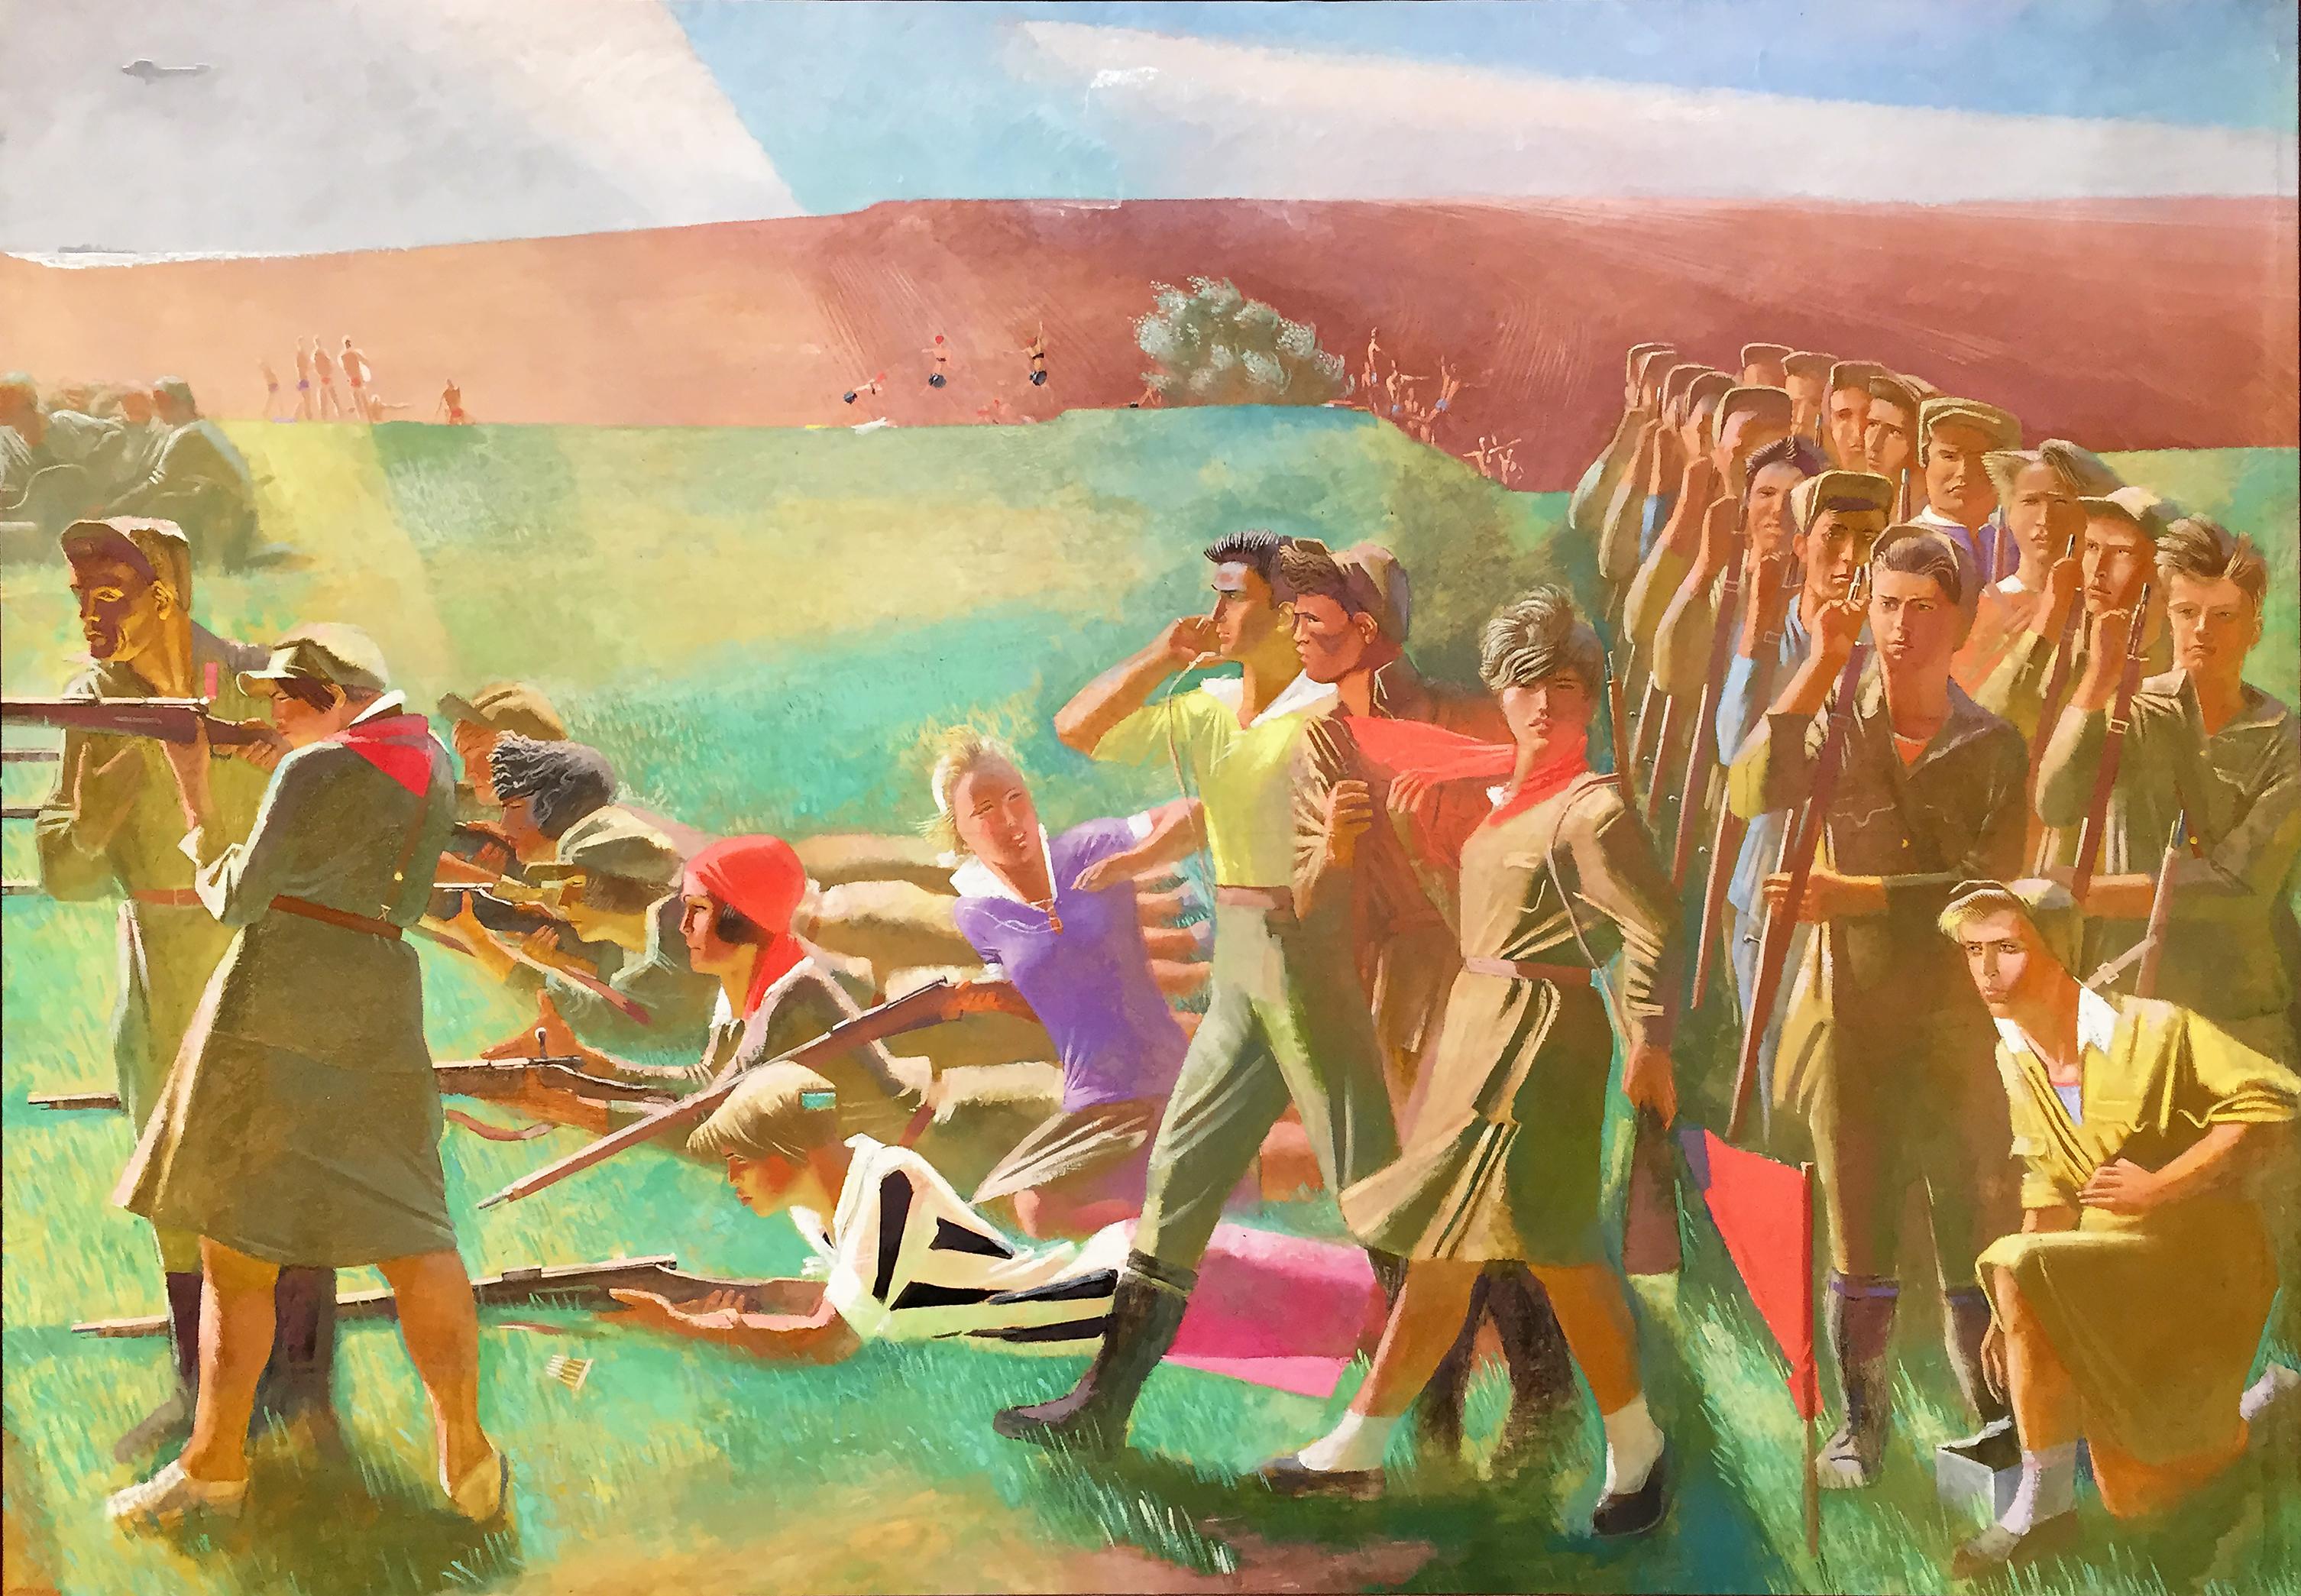 Alexander Samokhvalov - Komsomol militarizzato - tempera su tela (1930-33).